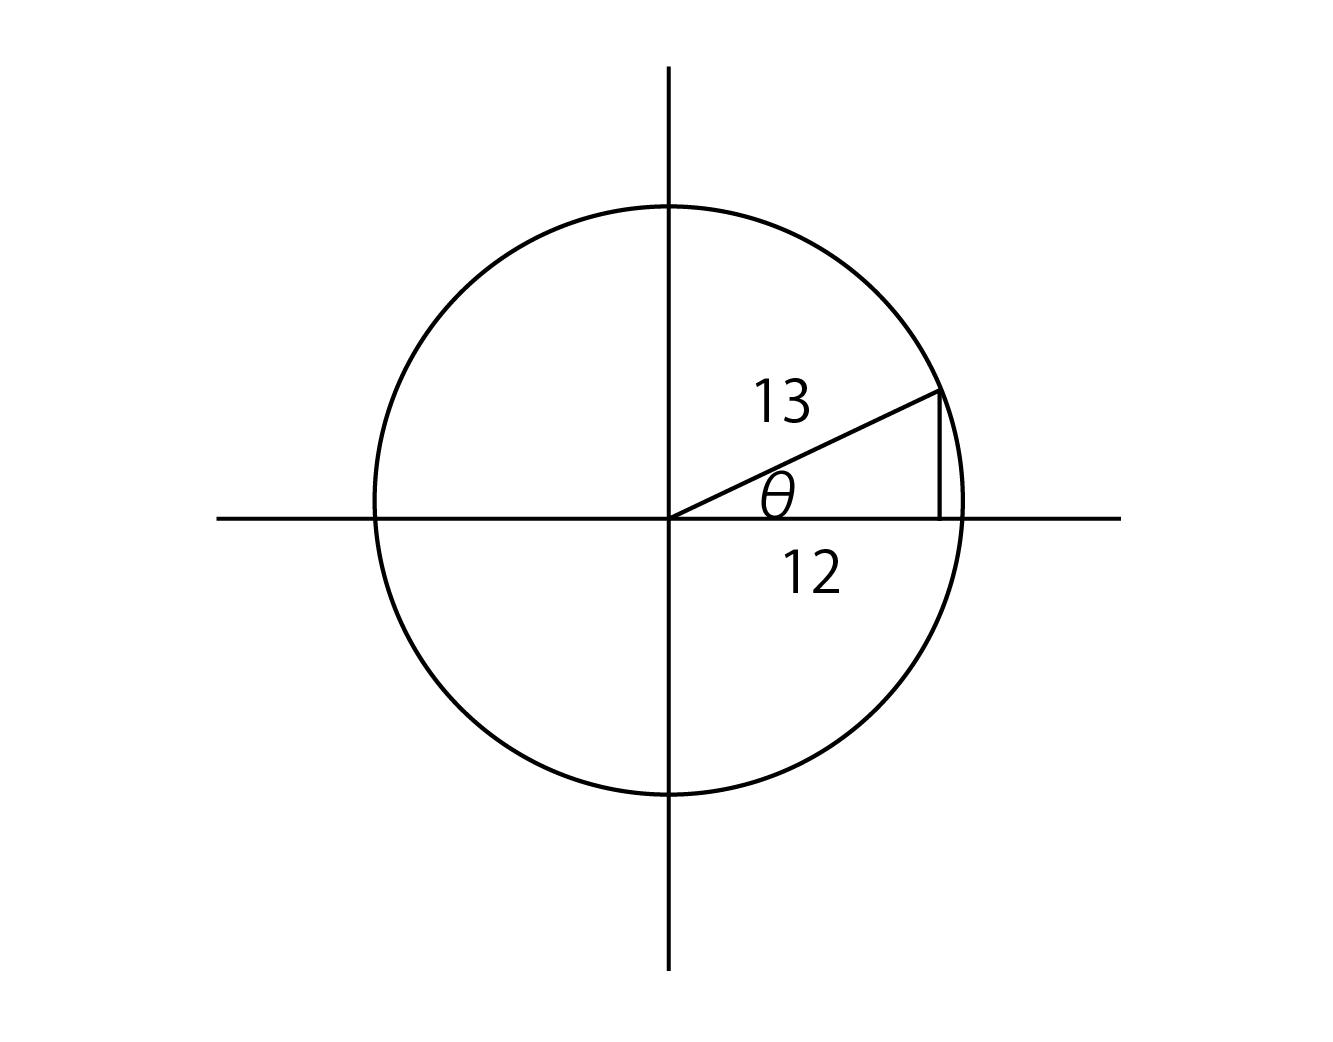 cosθ=12/13の三角形